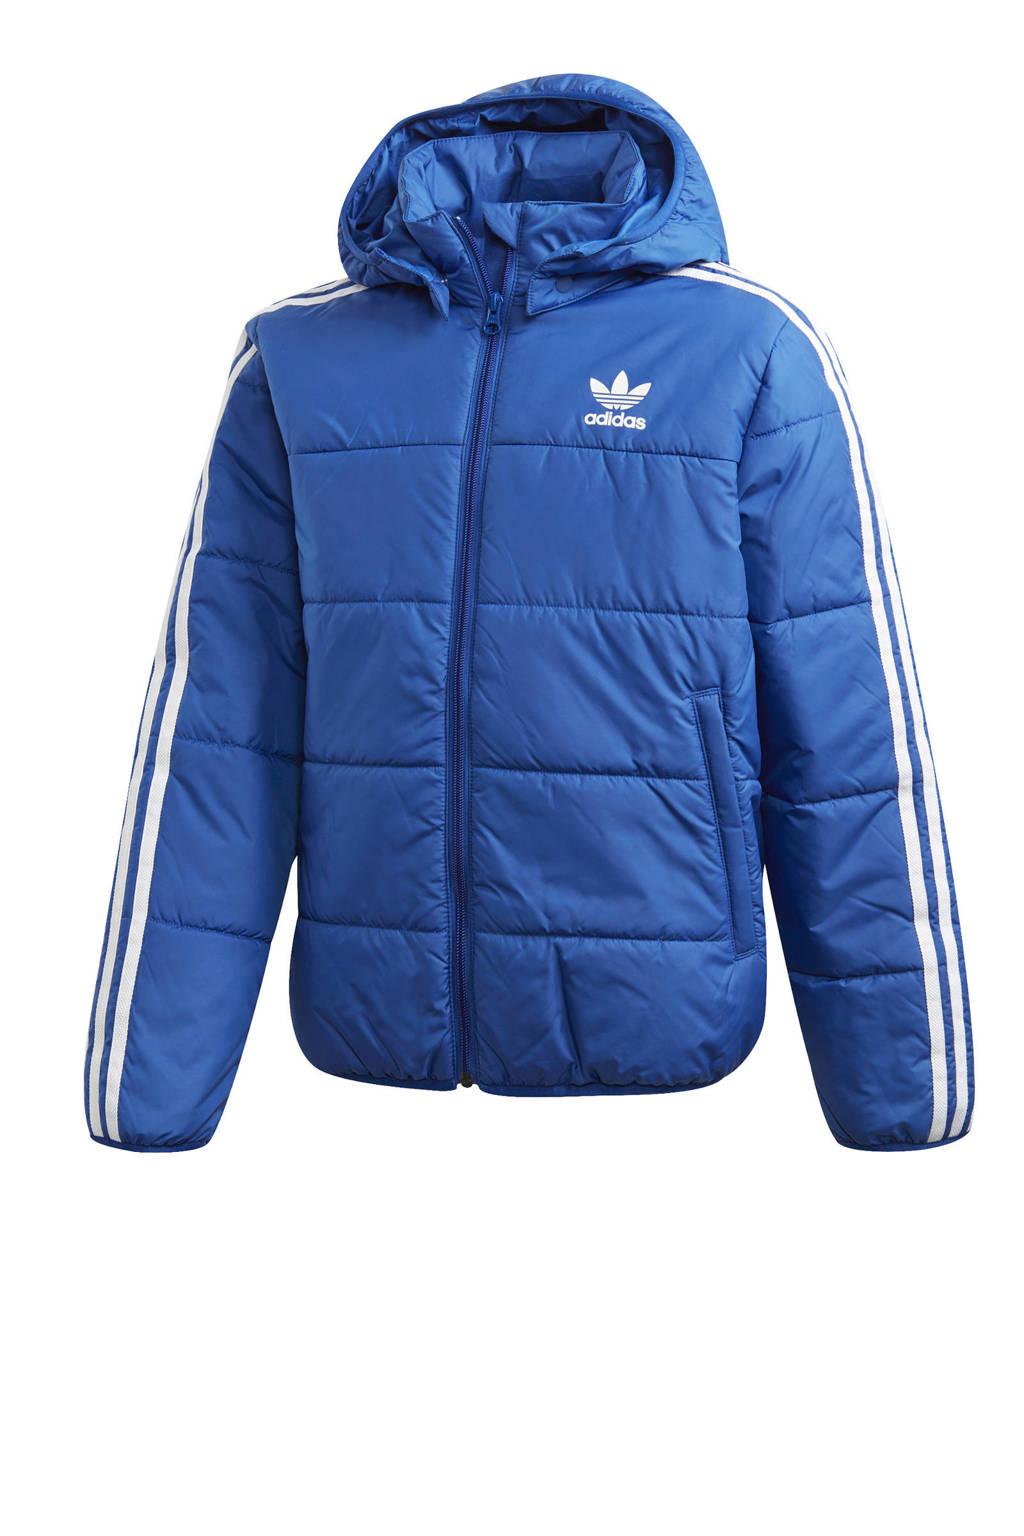 adidas Originals gewatteerd jack blauw/wit, Blauw/wit